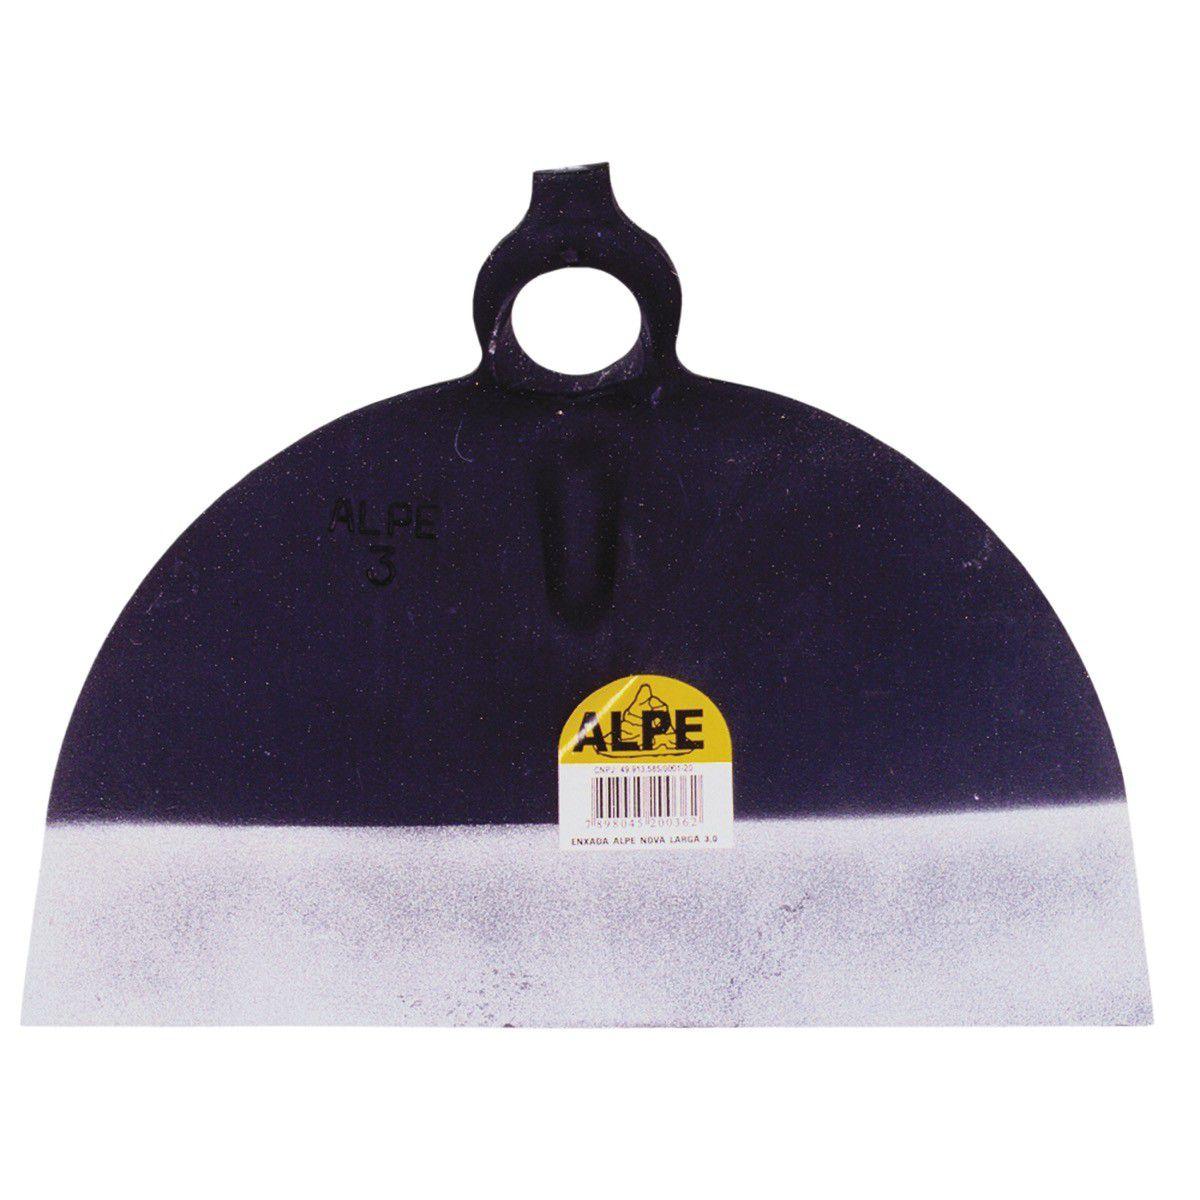 Enxada Alpe Nova S/ Solda 1,5 Libras Larga Cx/6